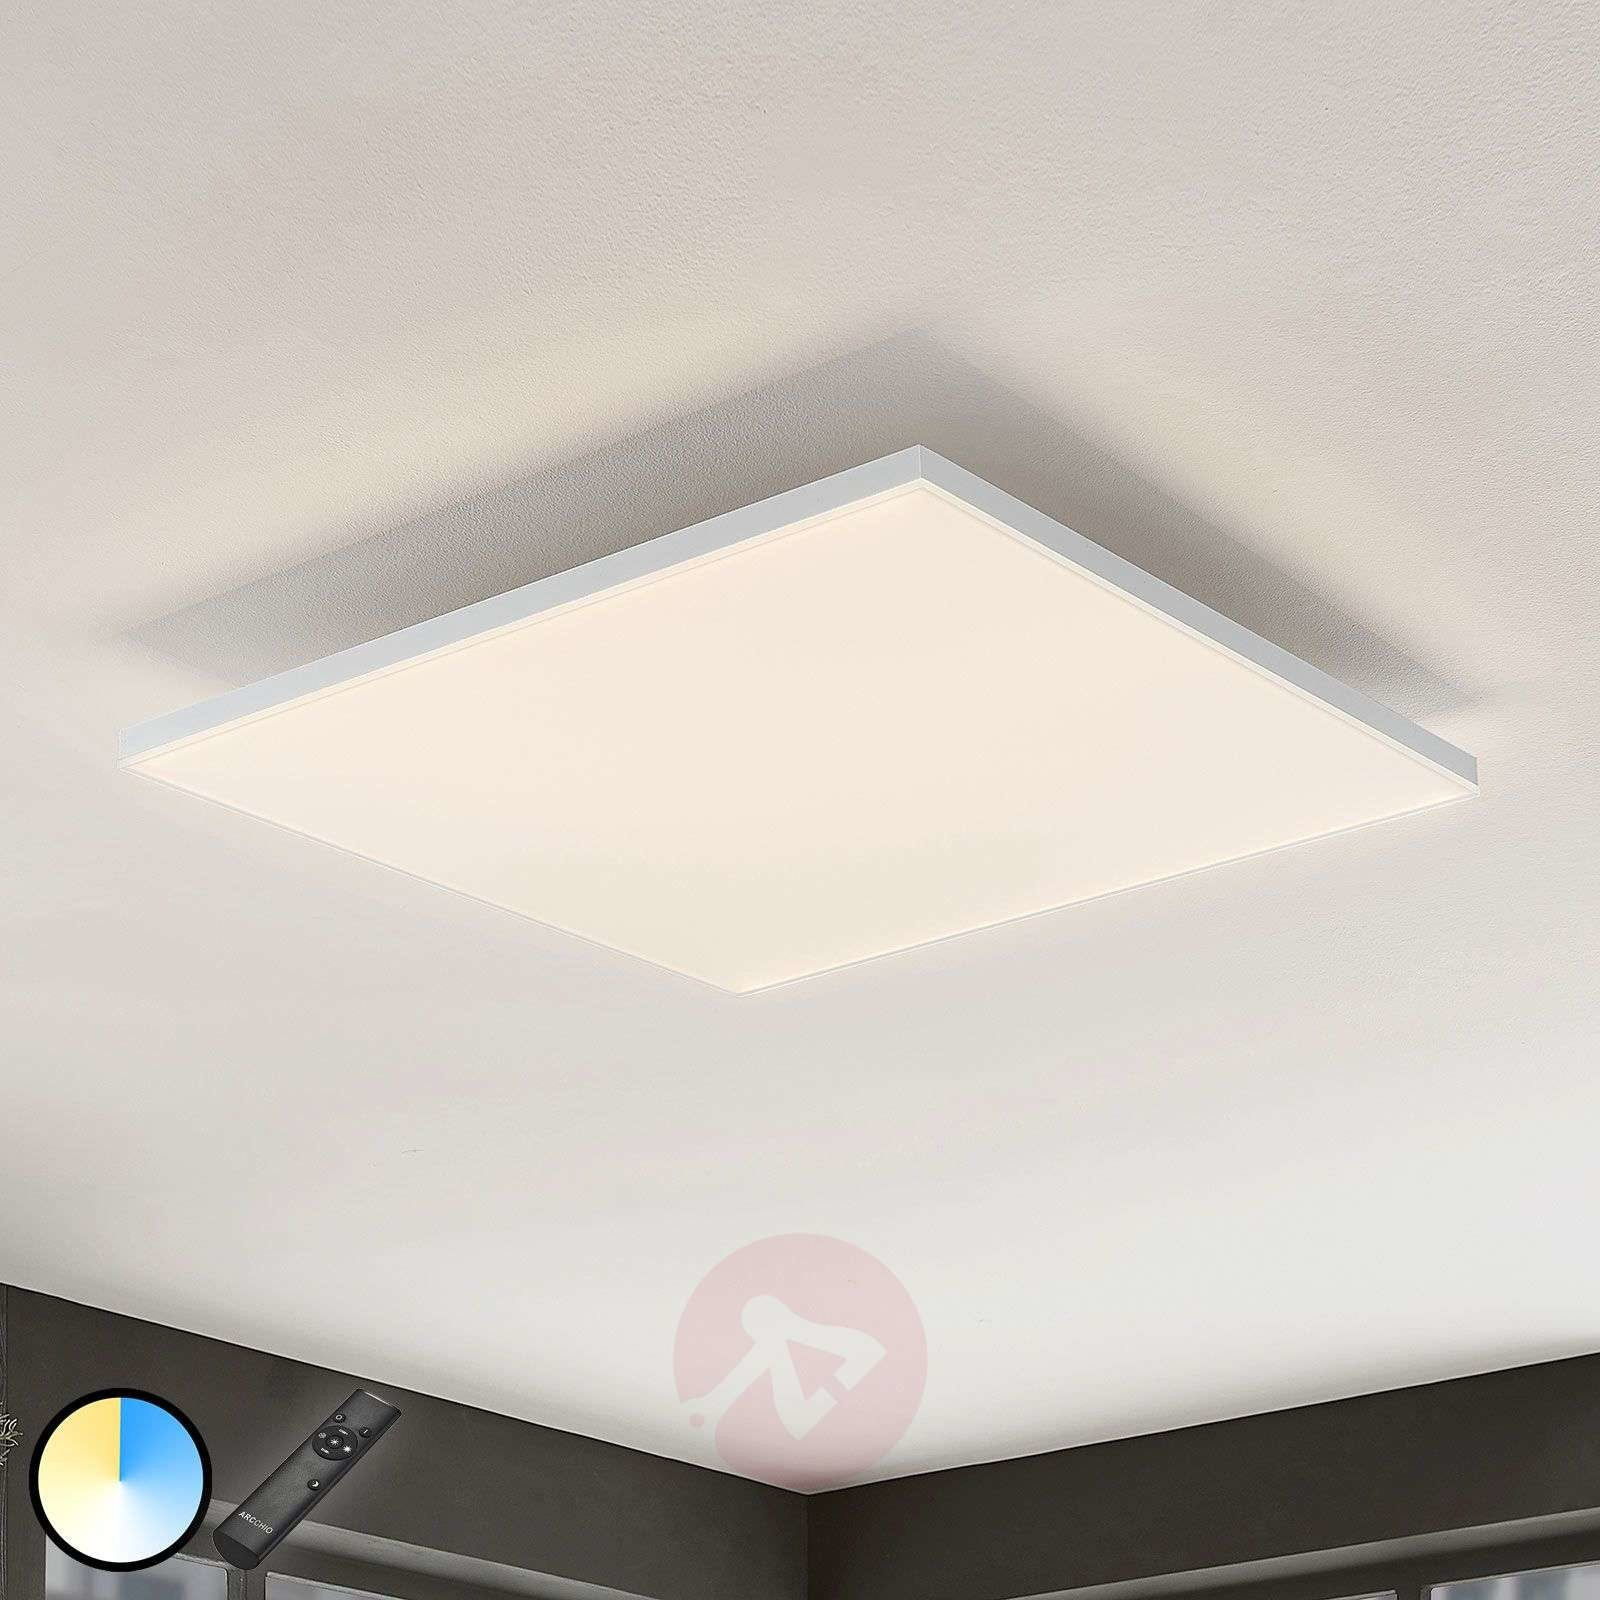 Lampenwelt com Panel LED Blaan CCT z pilotem 59,5 x 59,5cm